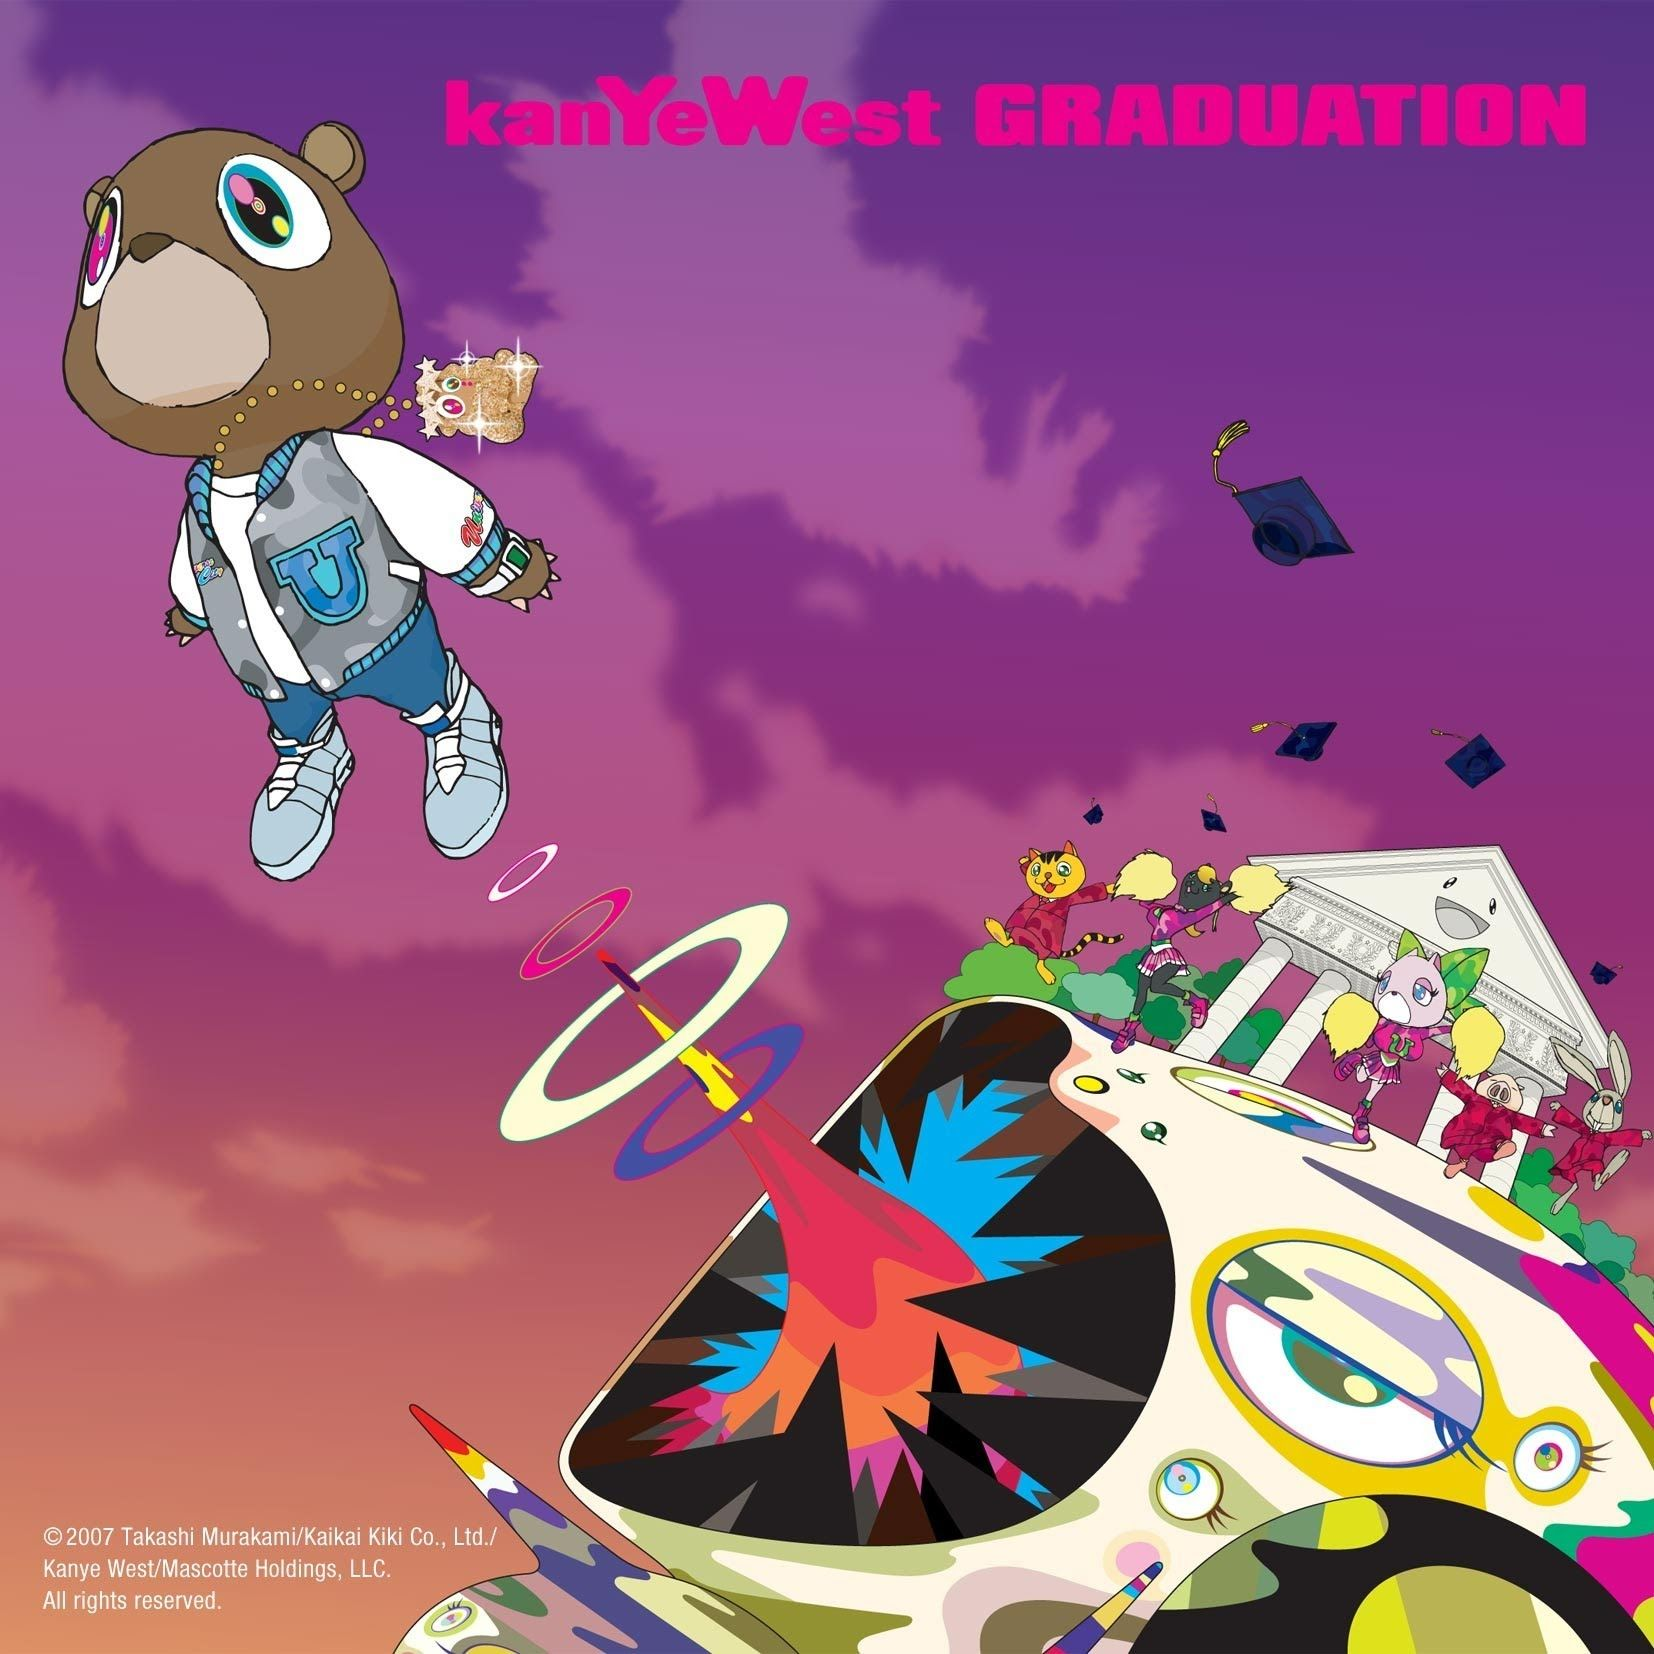 Youtube Kanye West Album Cover Graduation Album Rap Album Covers